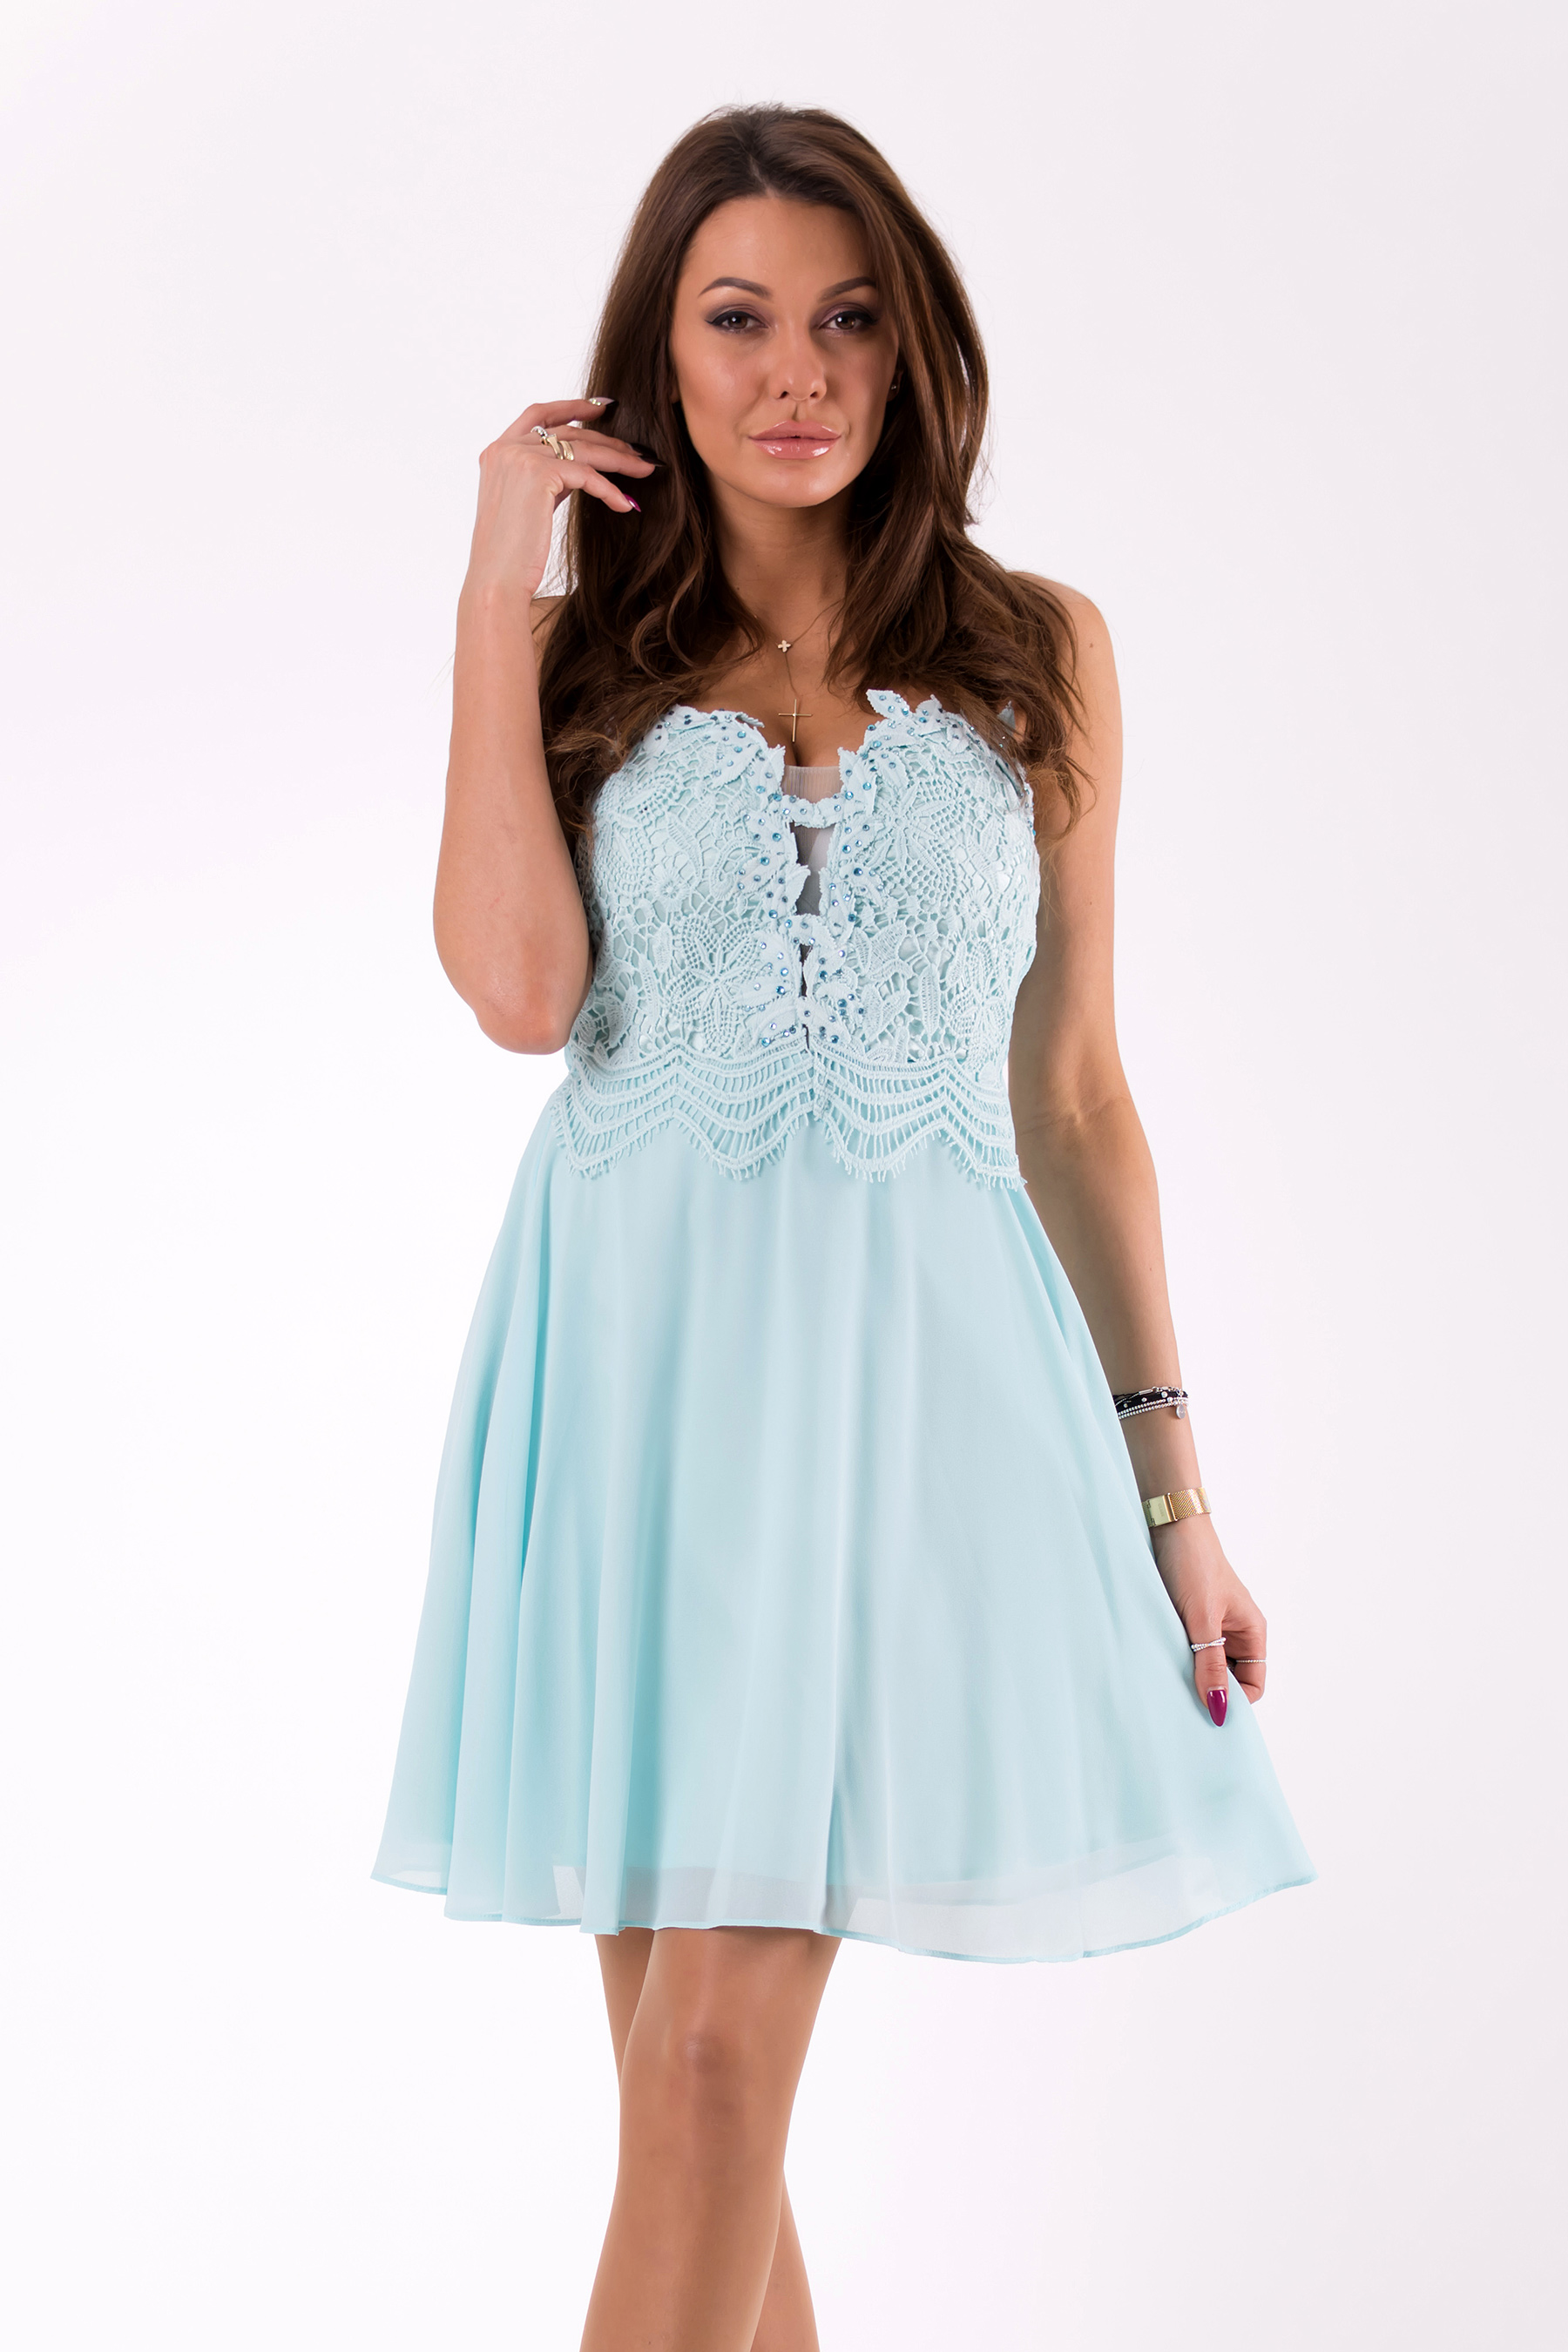 EVA&LOLA  DRESS blue 46040-2